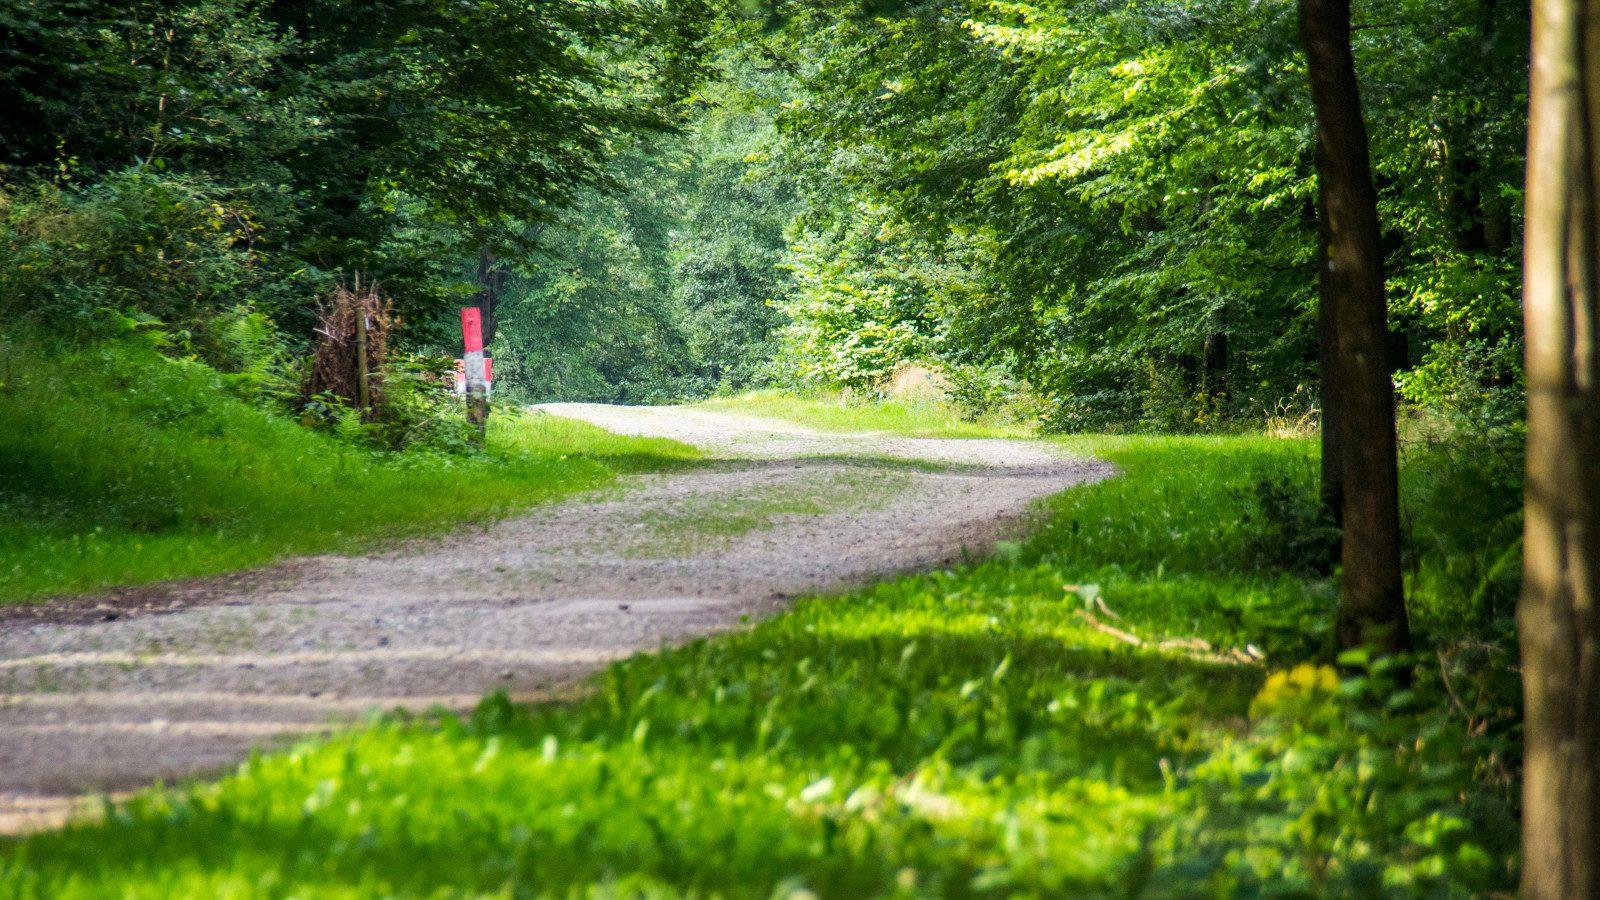 Chemin du Domaine provincial de Mirwart - Johan Barrot